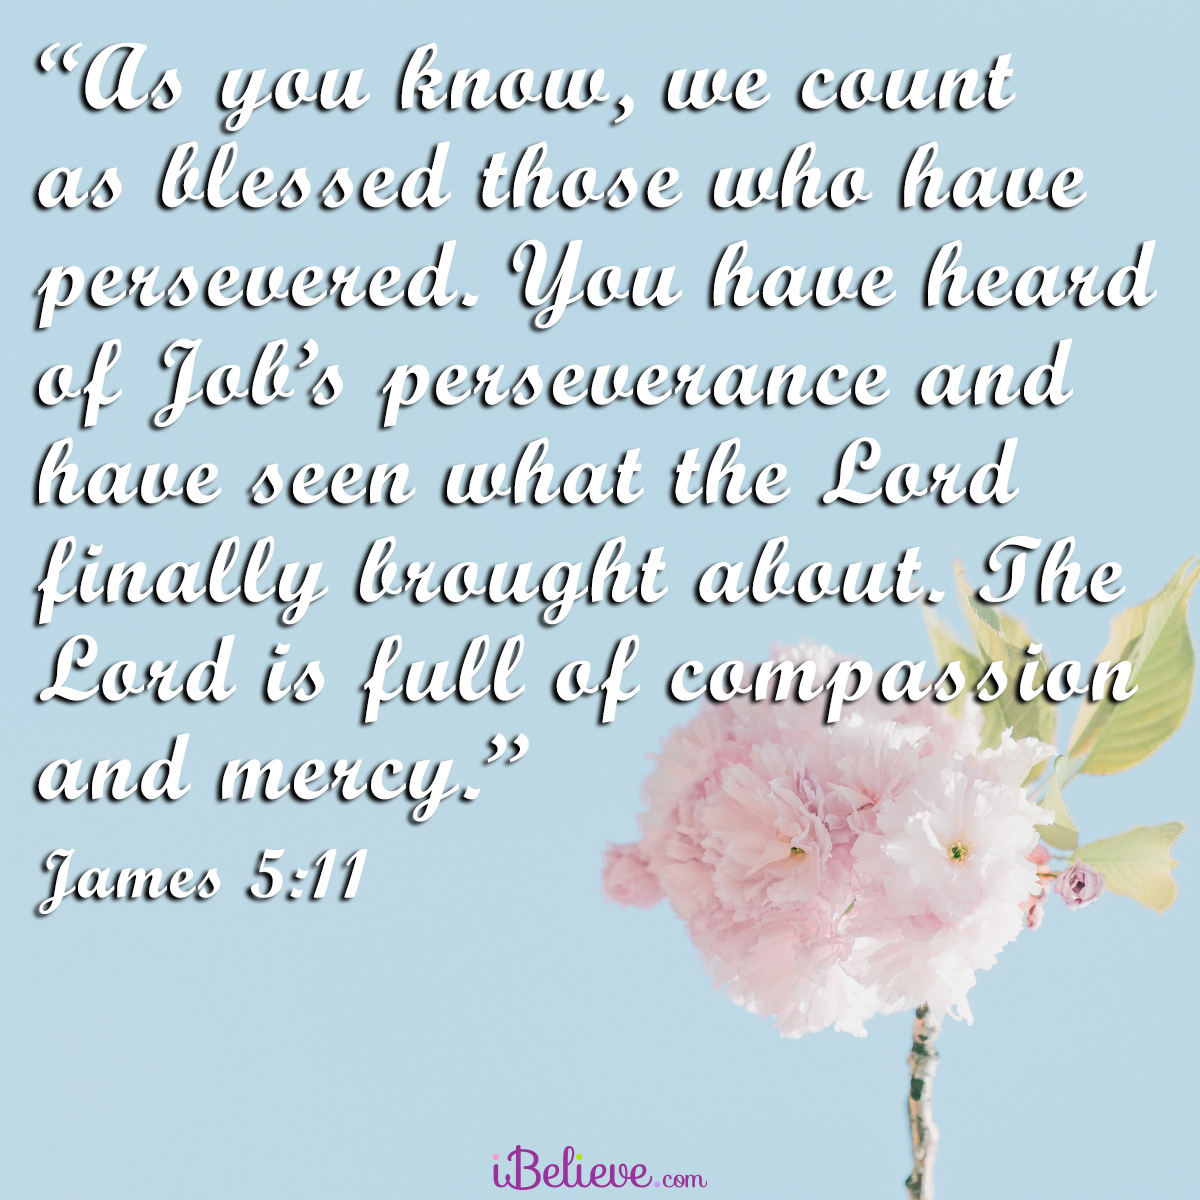 James 5:11, square